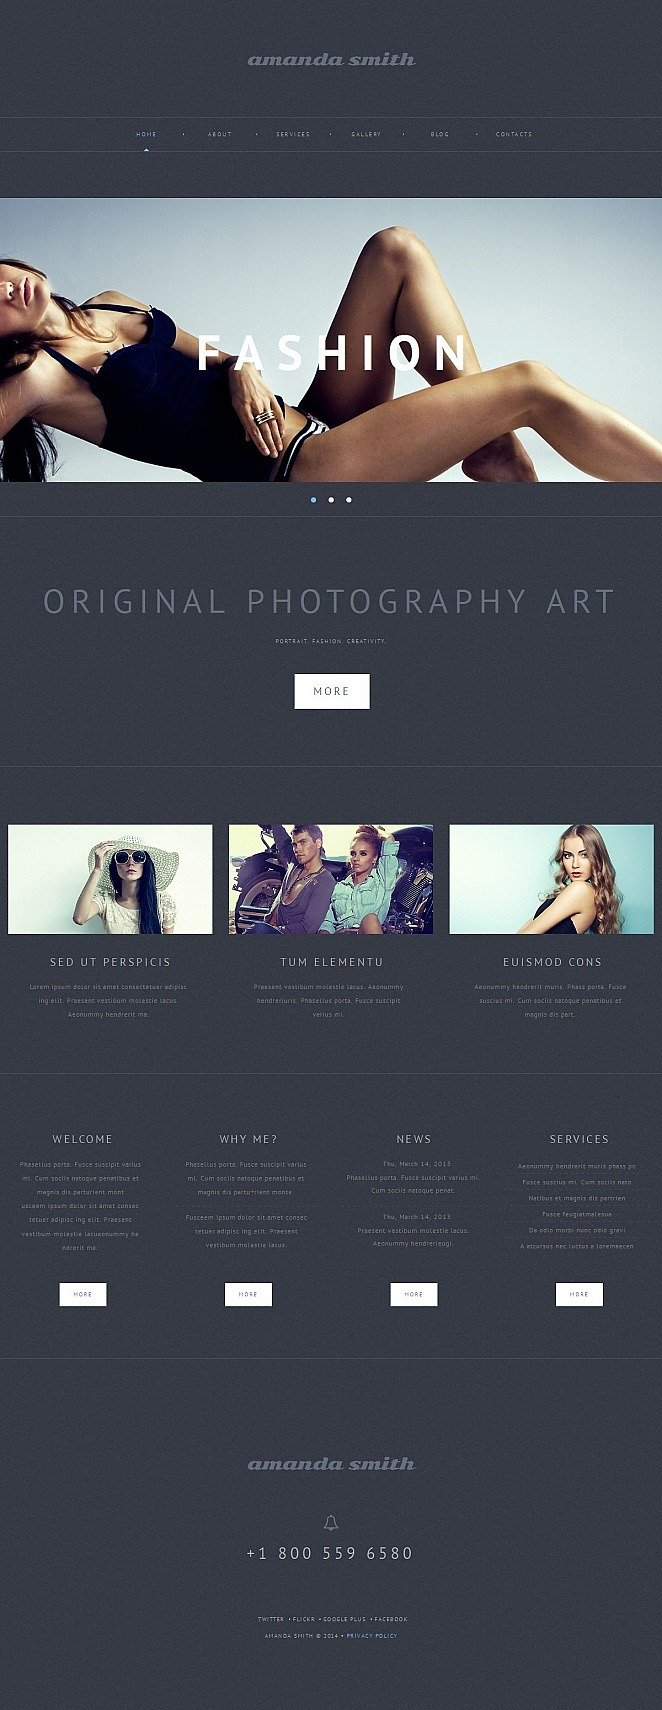 Photographer Portfolio Photo Gallery Template New Screenshots BIG